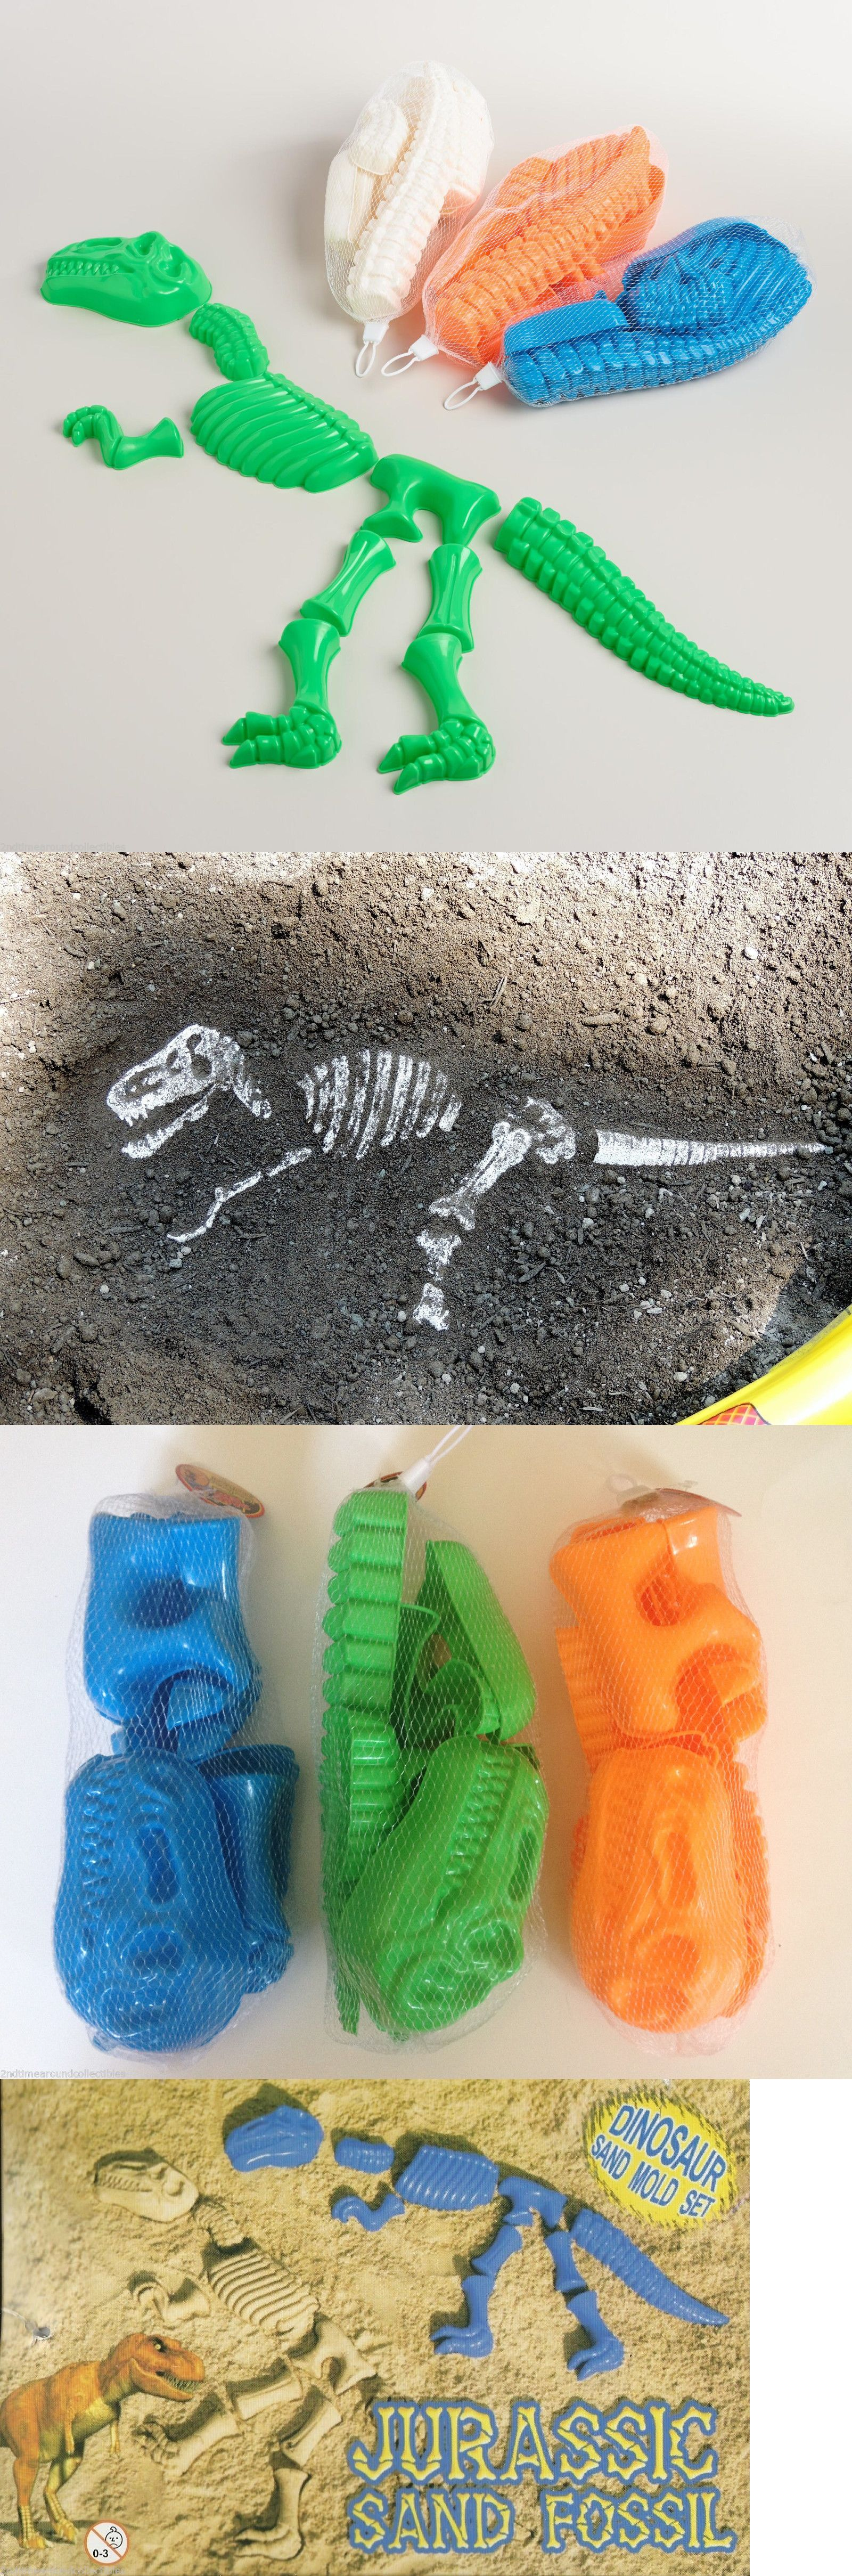 Sandbox Toys and Sandboxes 145990: T-Rex Dinosaur Bones Sand